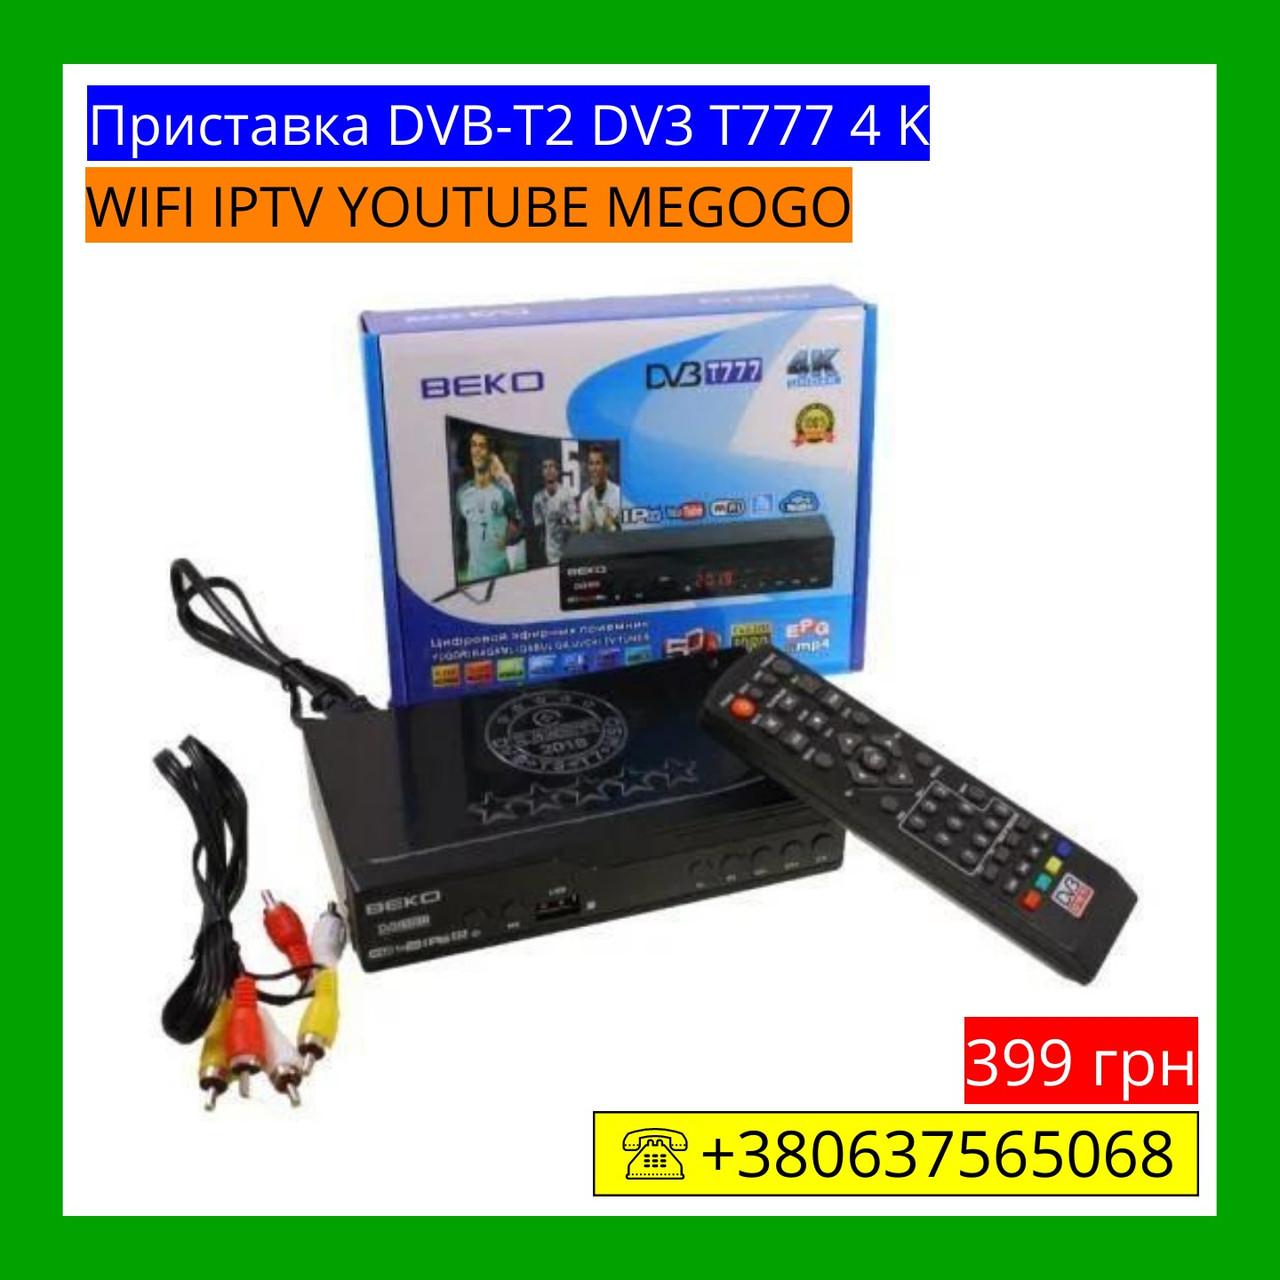 4K Тюнер Т2 HDOpenbox тюнер DV3 T777 / IPTV / YouTube / WIFI /